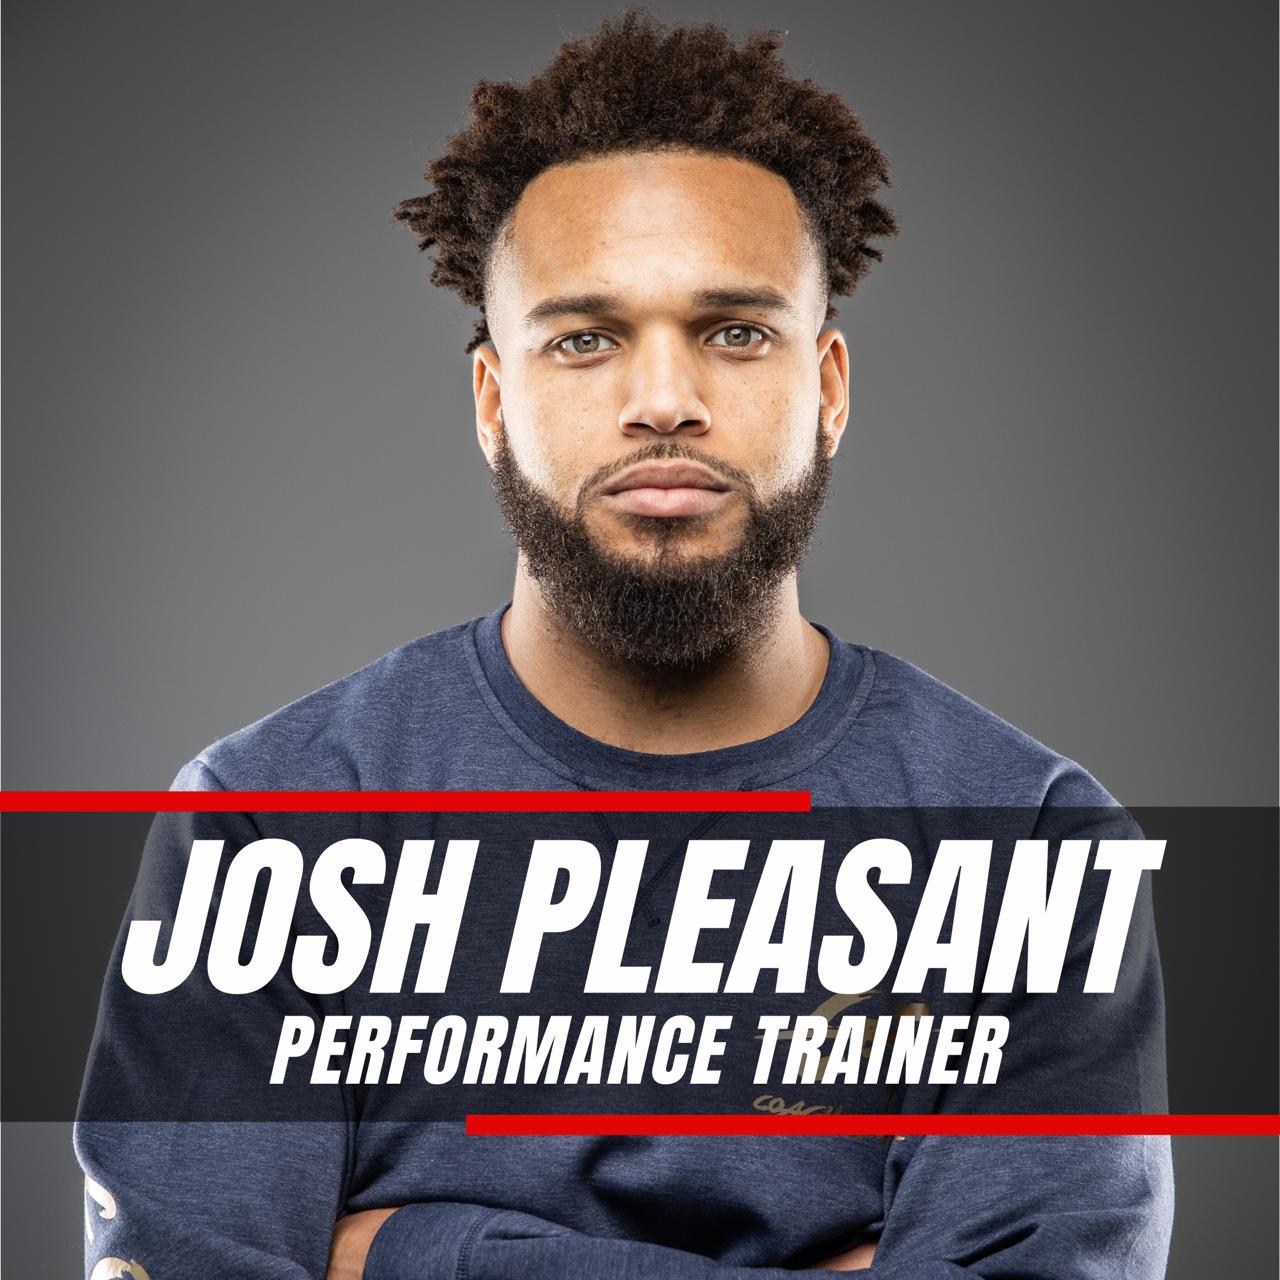 Josh Pleasant